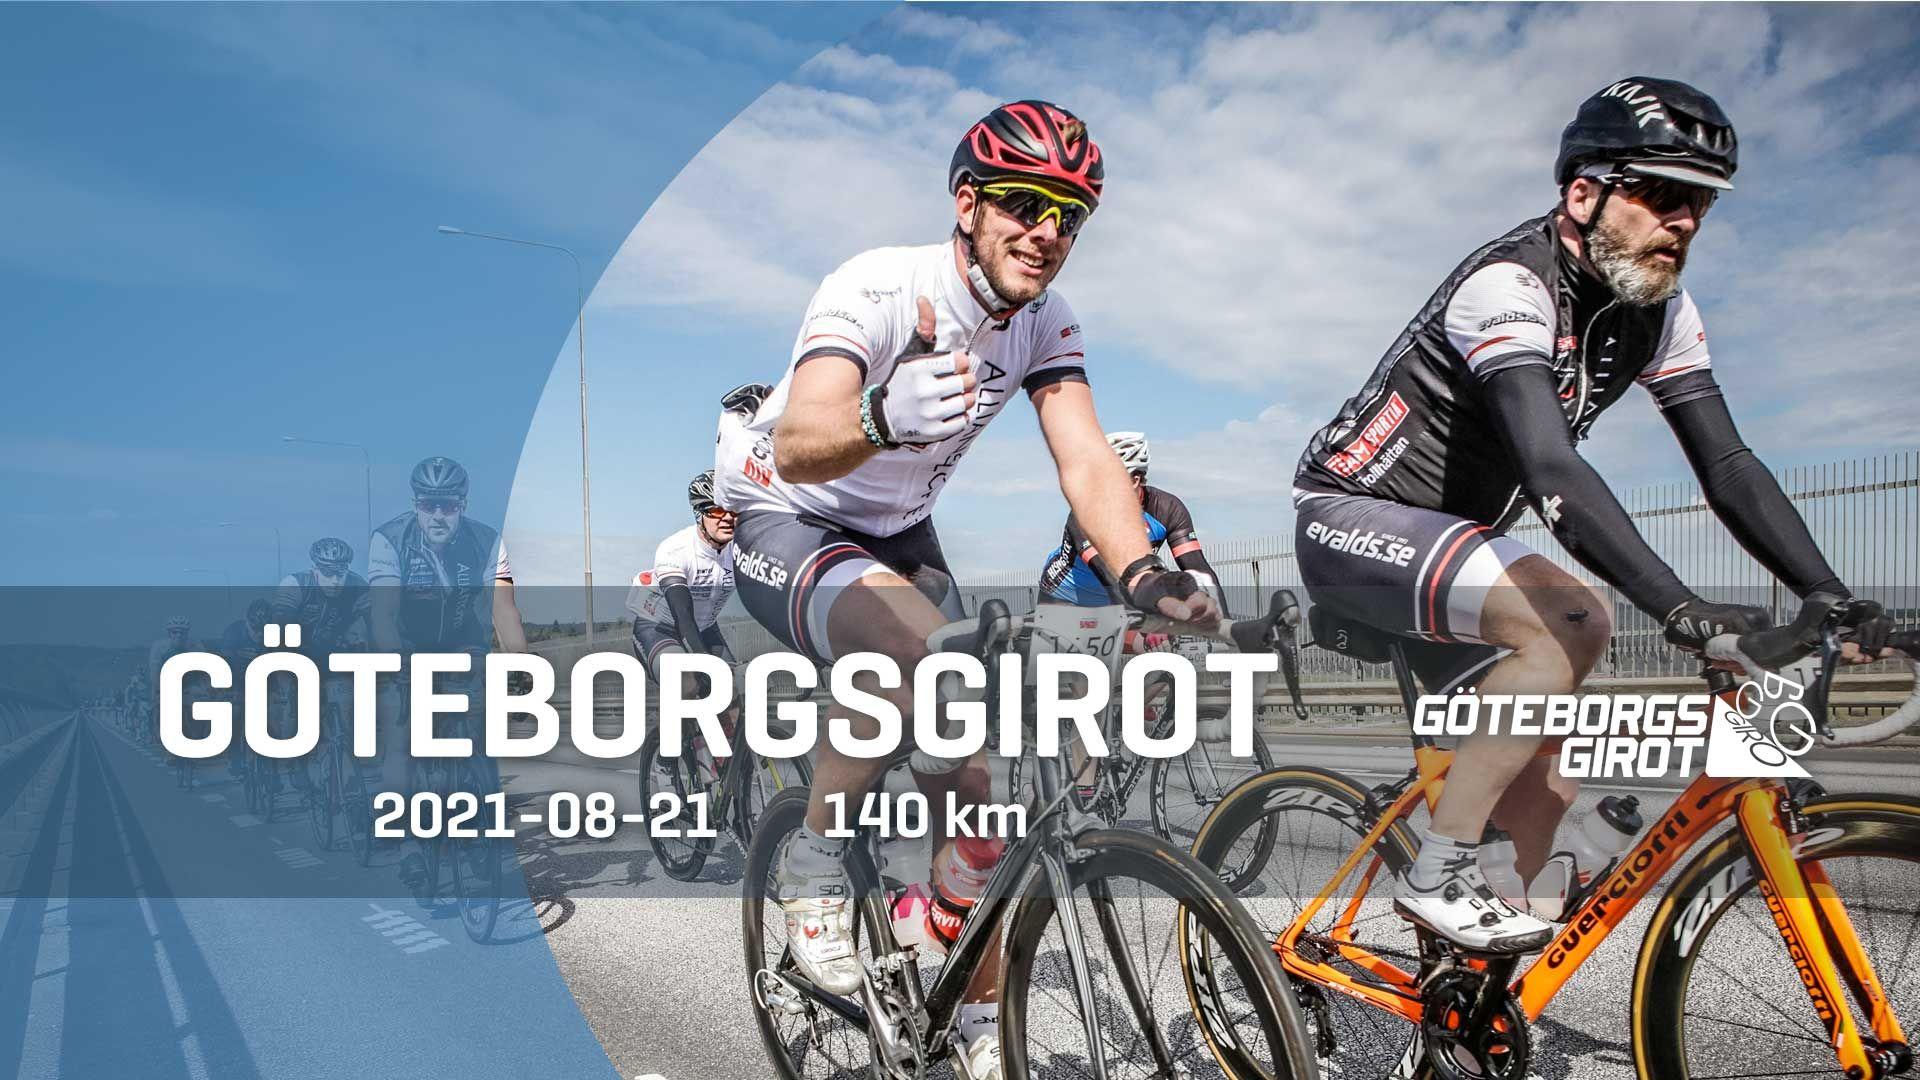 Göteborgsgirot 140km